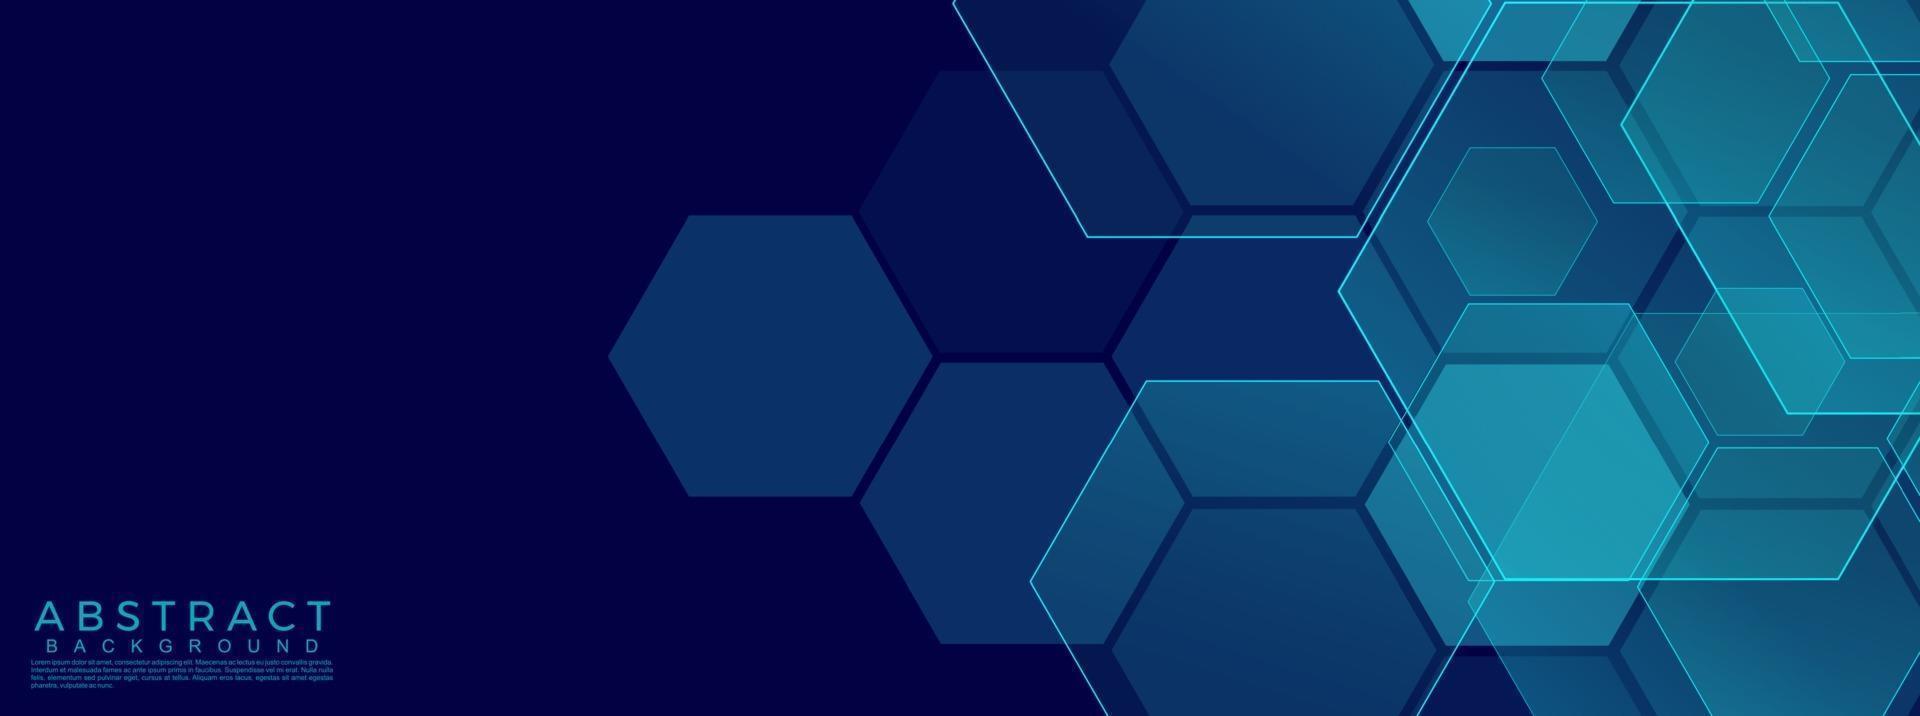 sexkantig abstrakt teknikbakgrund. vektor illustration